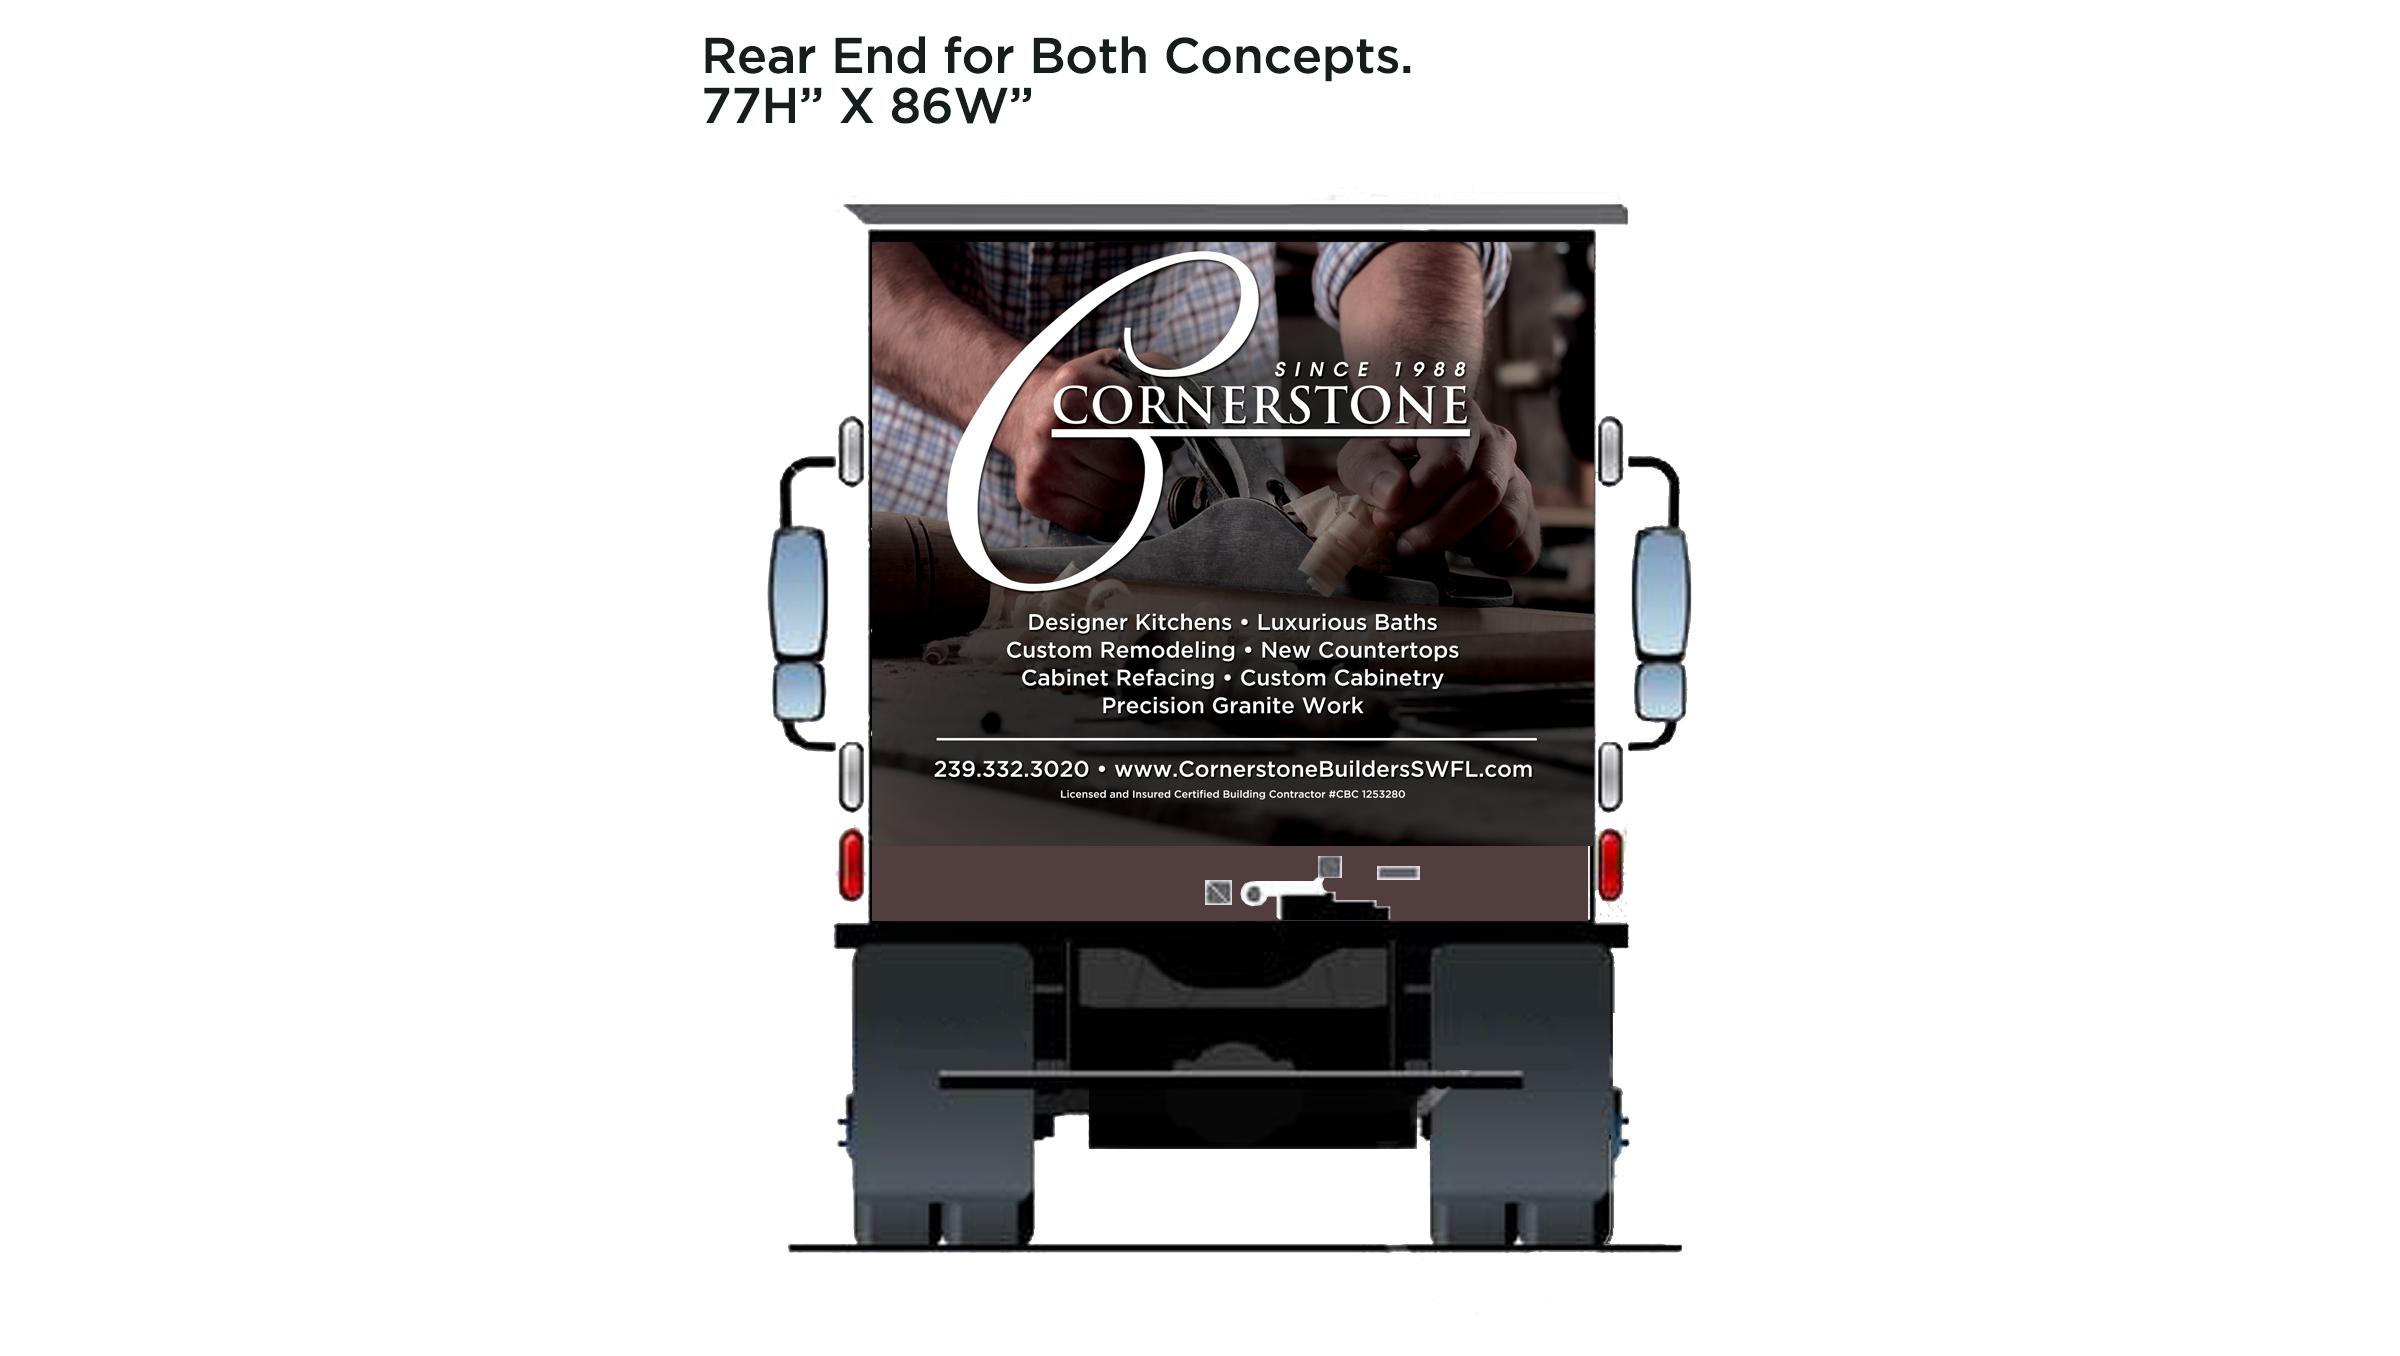 Truck Rear Design 02-02-18.png